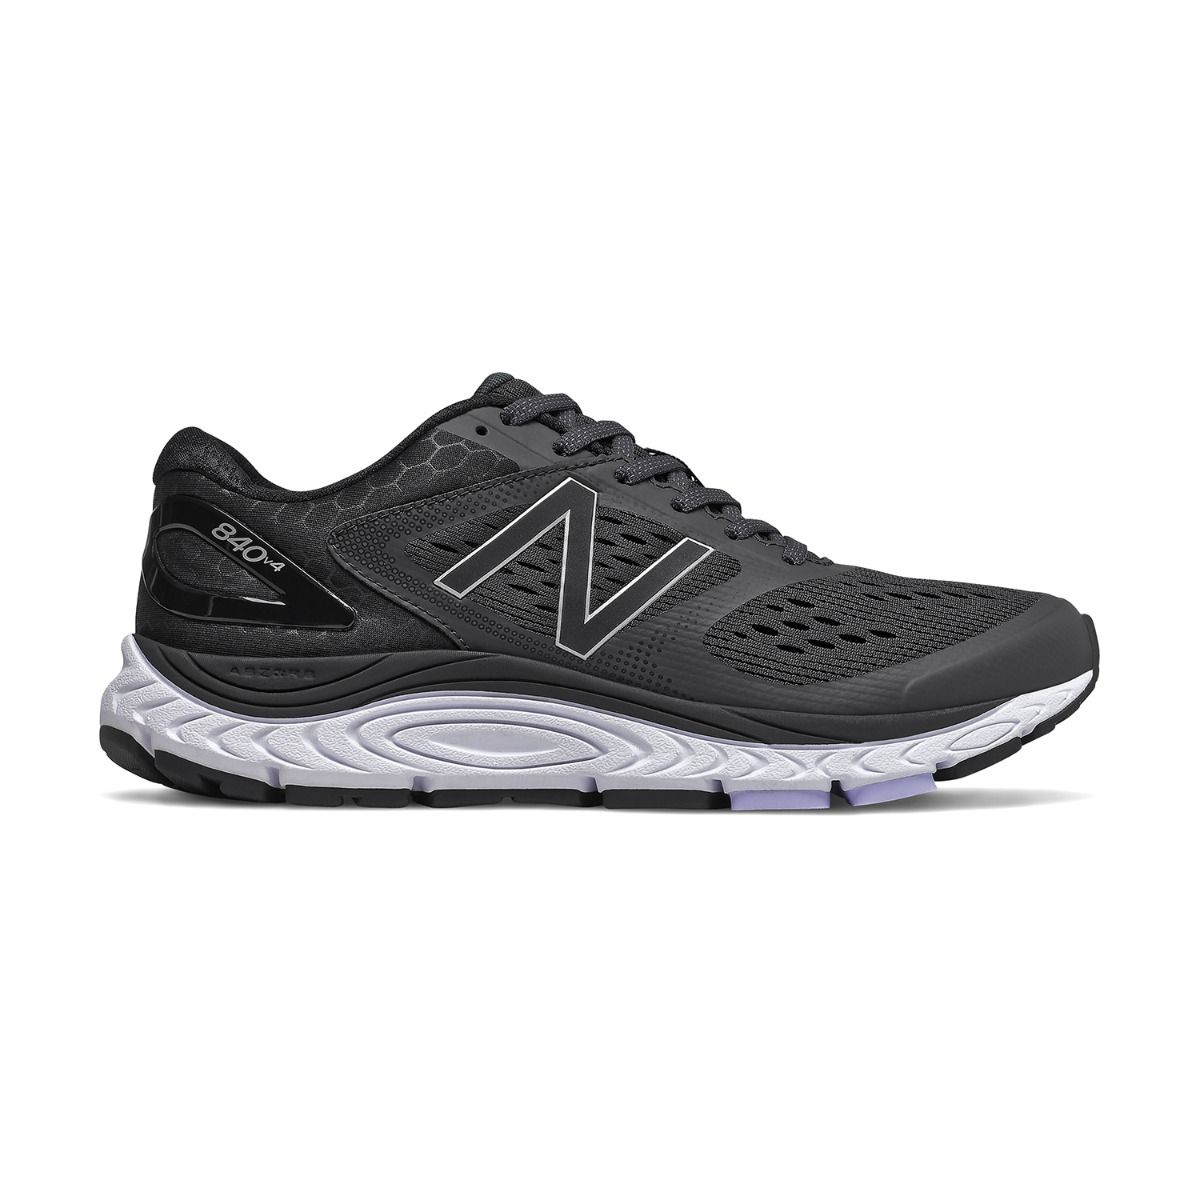 New Balance Women's 840v4 B Running Shoe